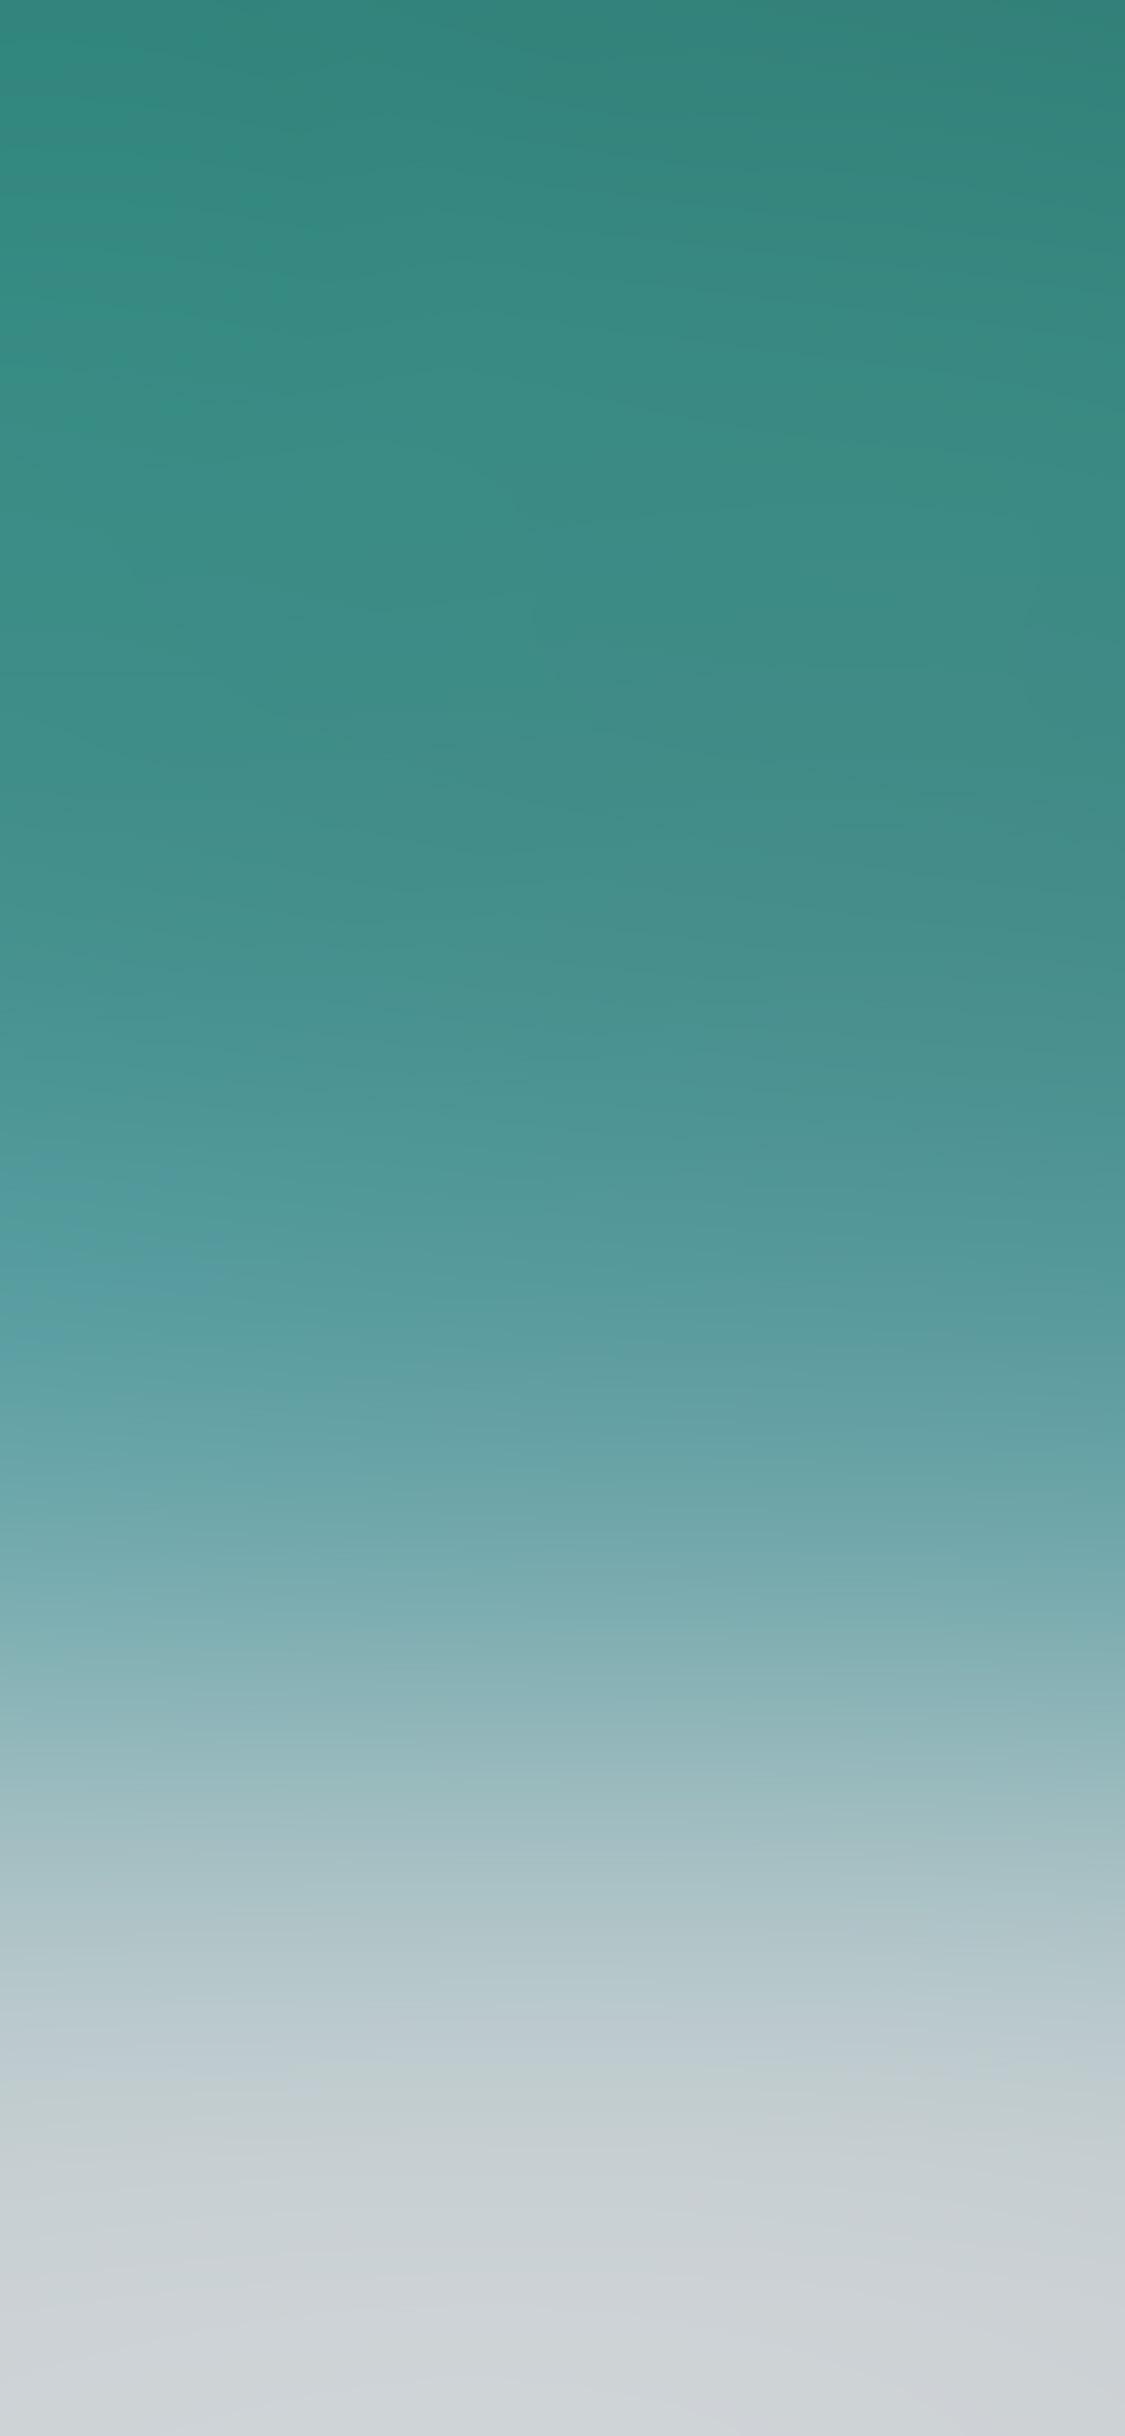 iPhonexpapers.com-Apple-iPhone-wallpaper-so27-blur-gradation-green